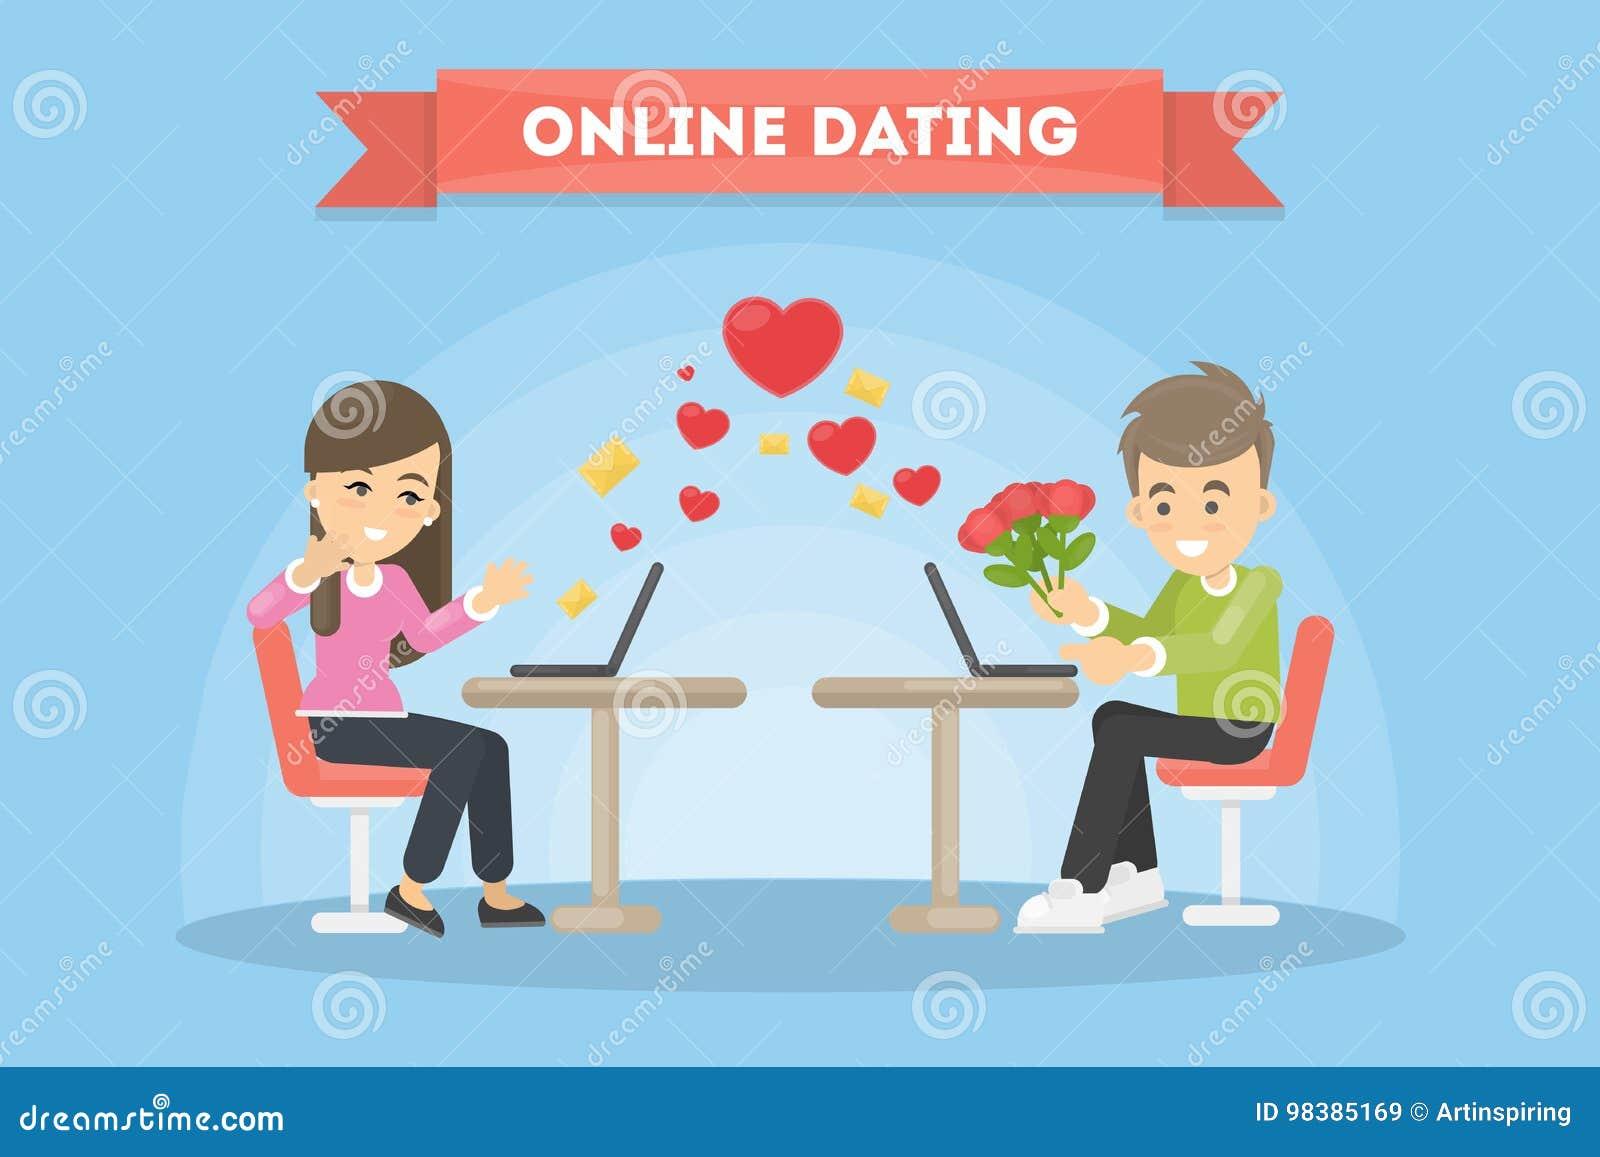 juggling online dating